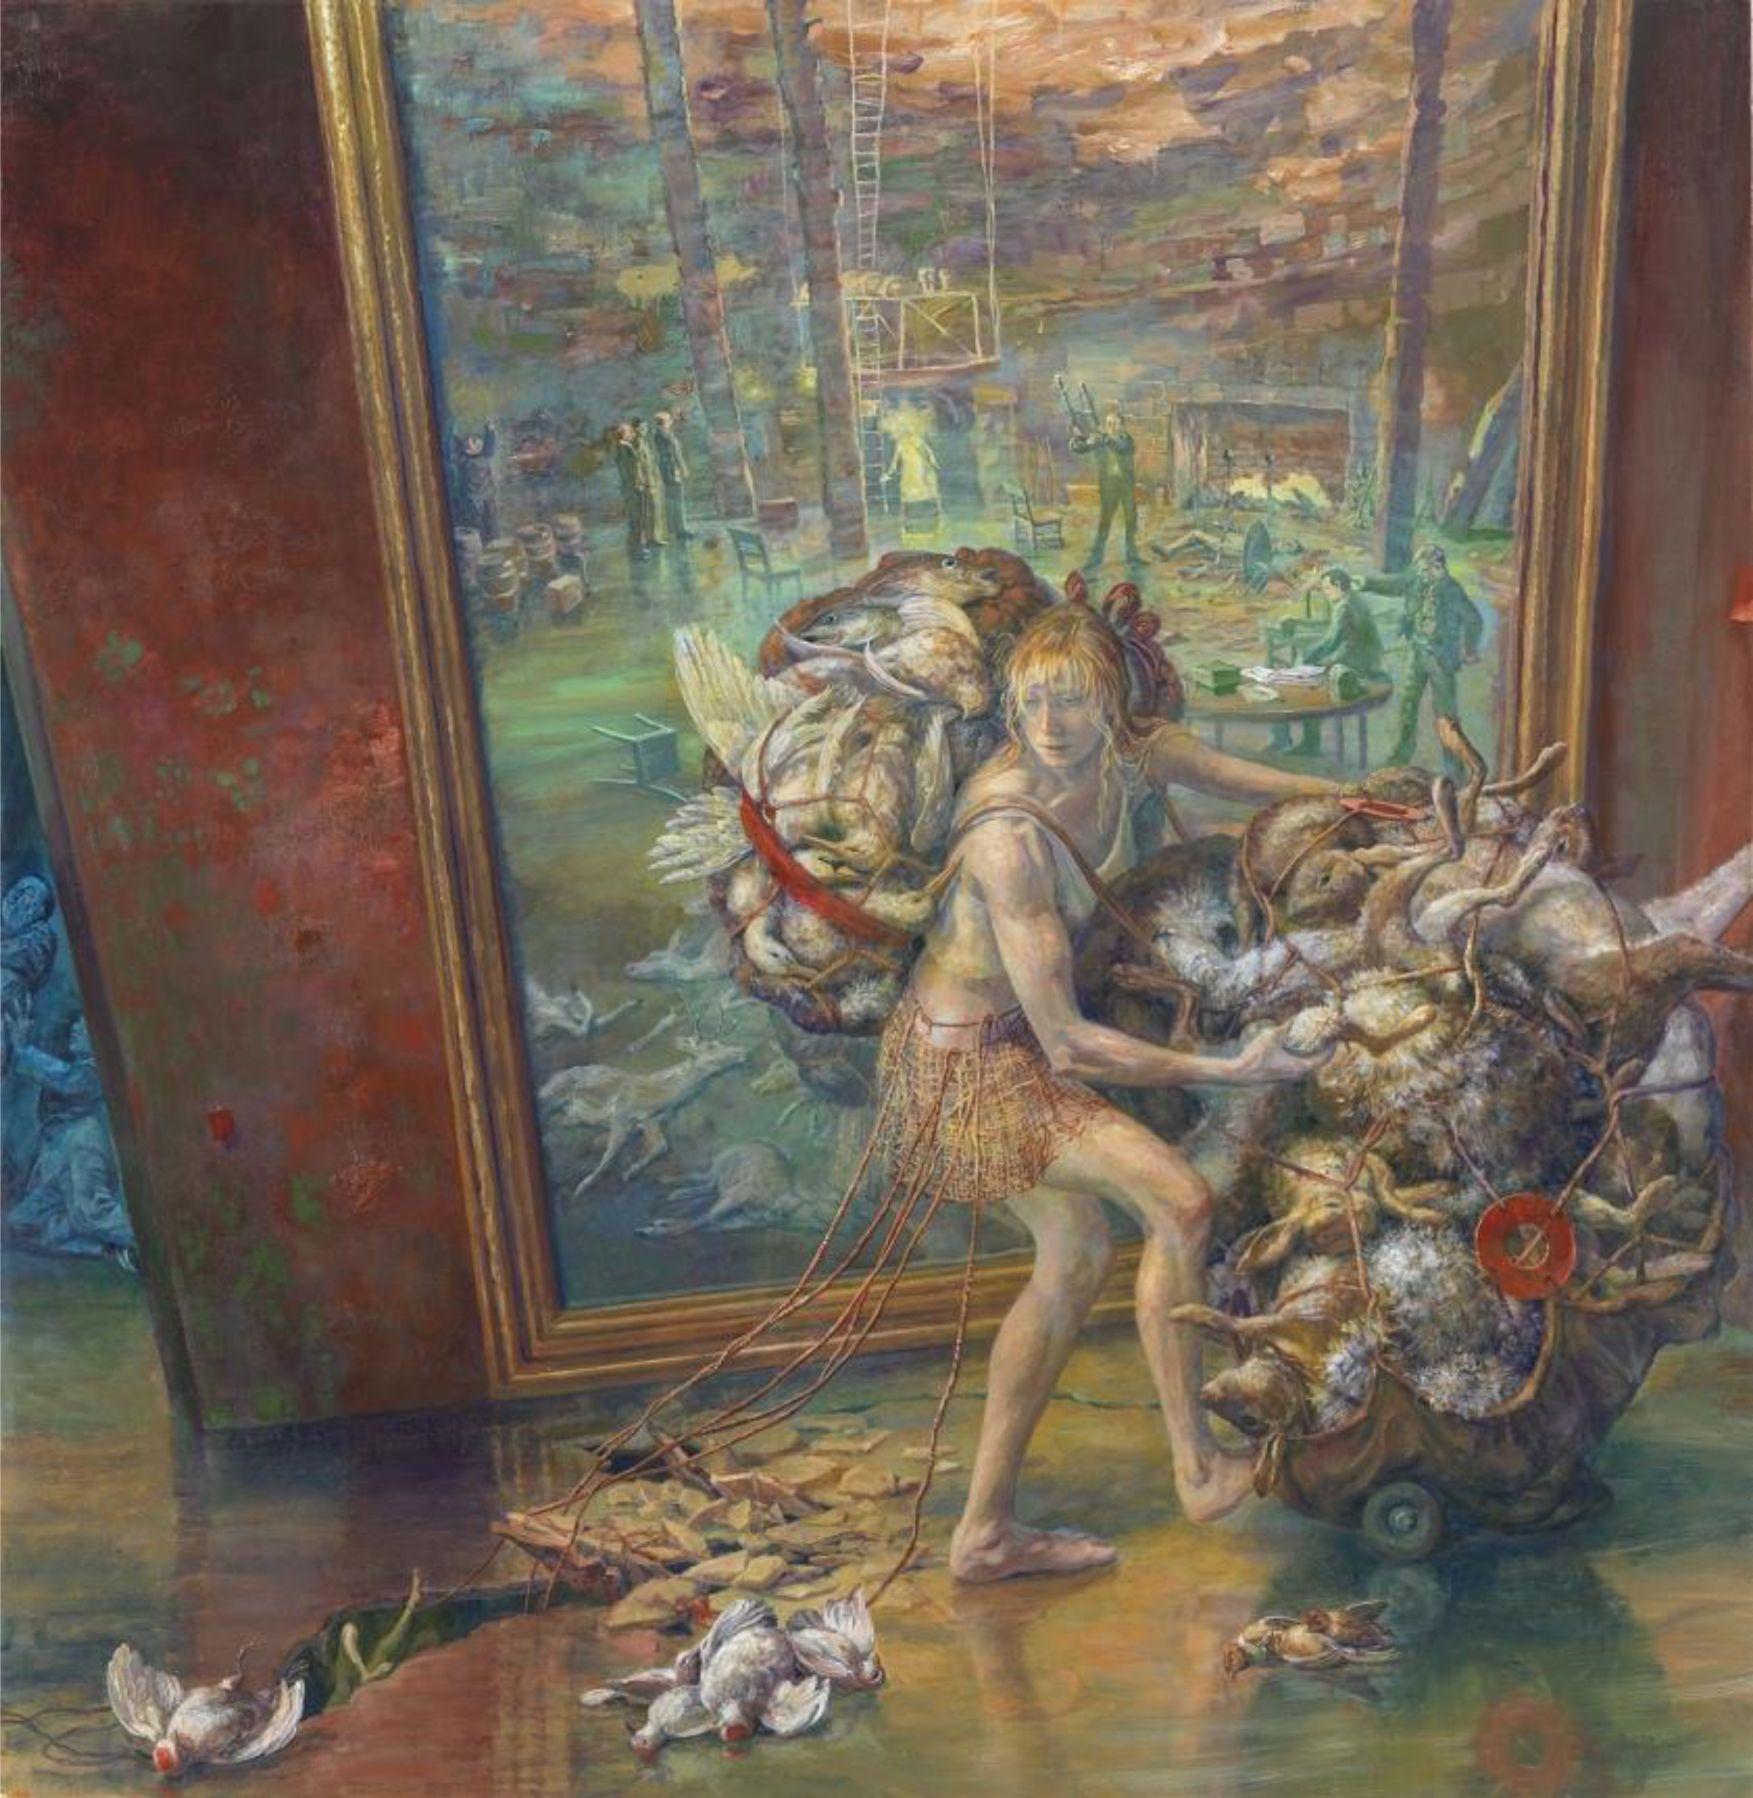 Julie Heffernan, Self Portrait with Cargo, 2014, oil on canvas, 68 x 66 inches